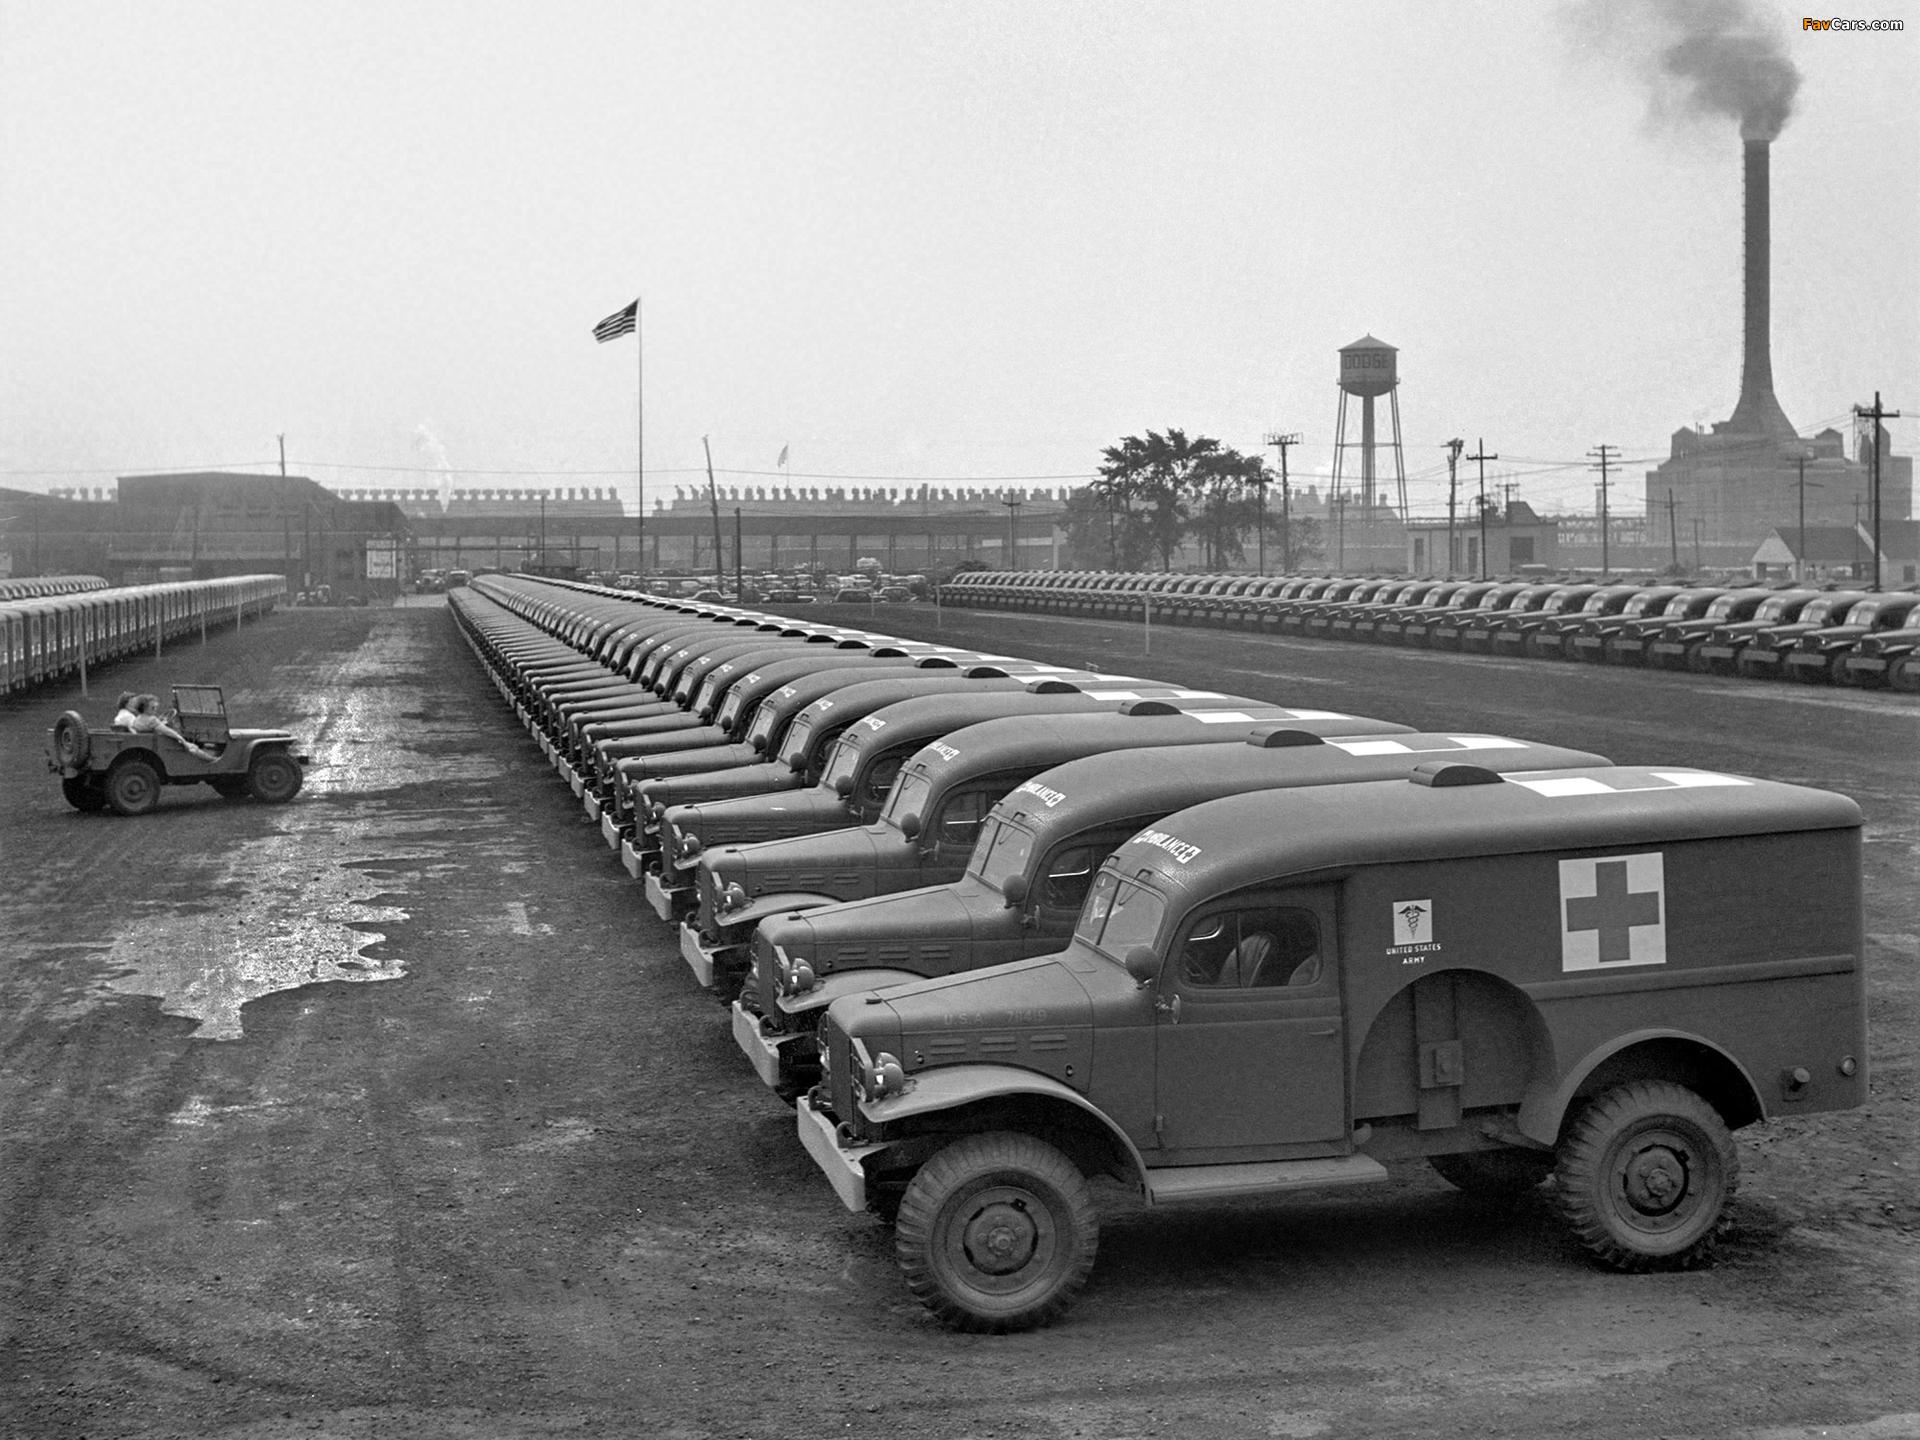 Images of Dodge WC-54 Ambulance by Wayne (T214) 1942–44 (1920 x 1440)